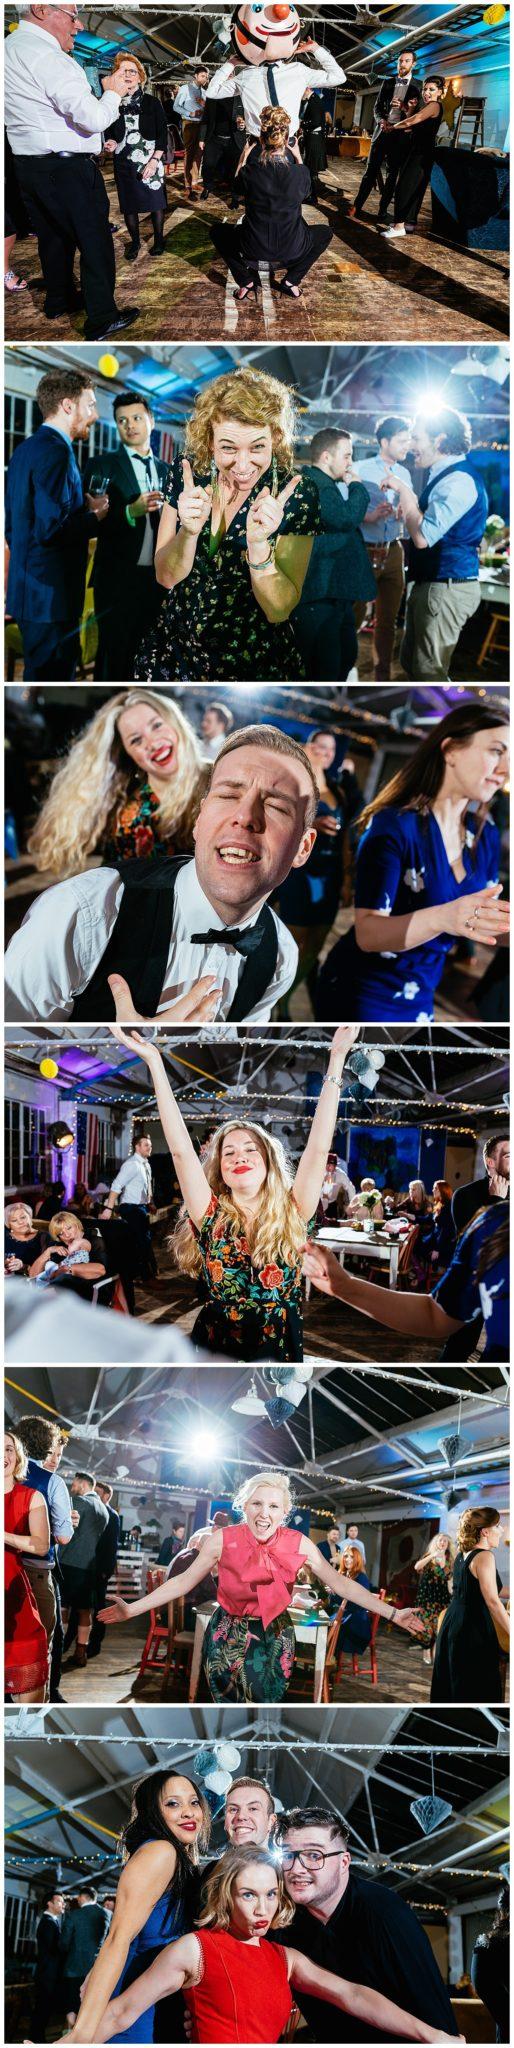 Michael James London Warehouse Hay Wedding 095-NIKON D810 18 mm 1-125 sec at f - 4.0 ISO 400 04 Mar 1903 (976)__Alternative Wedding Photographers London Gay Samesex Colourful.jpg